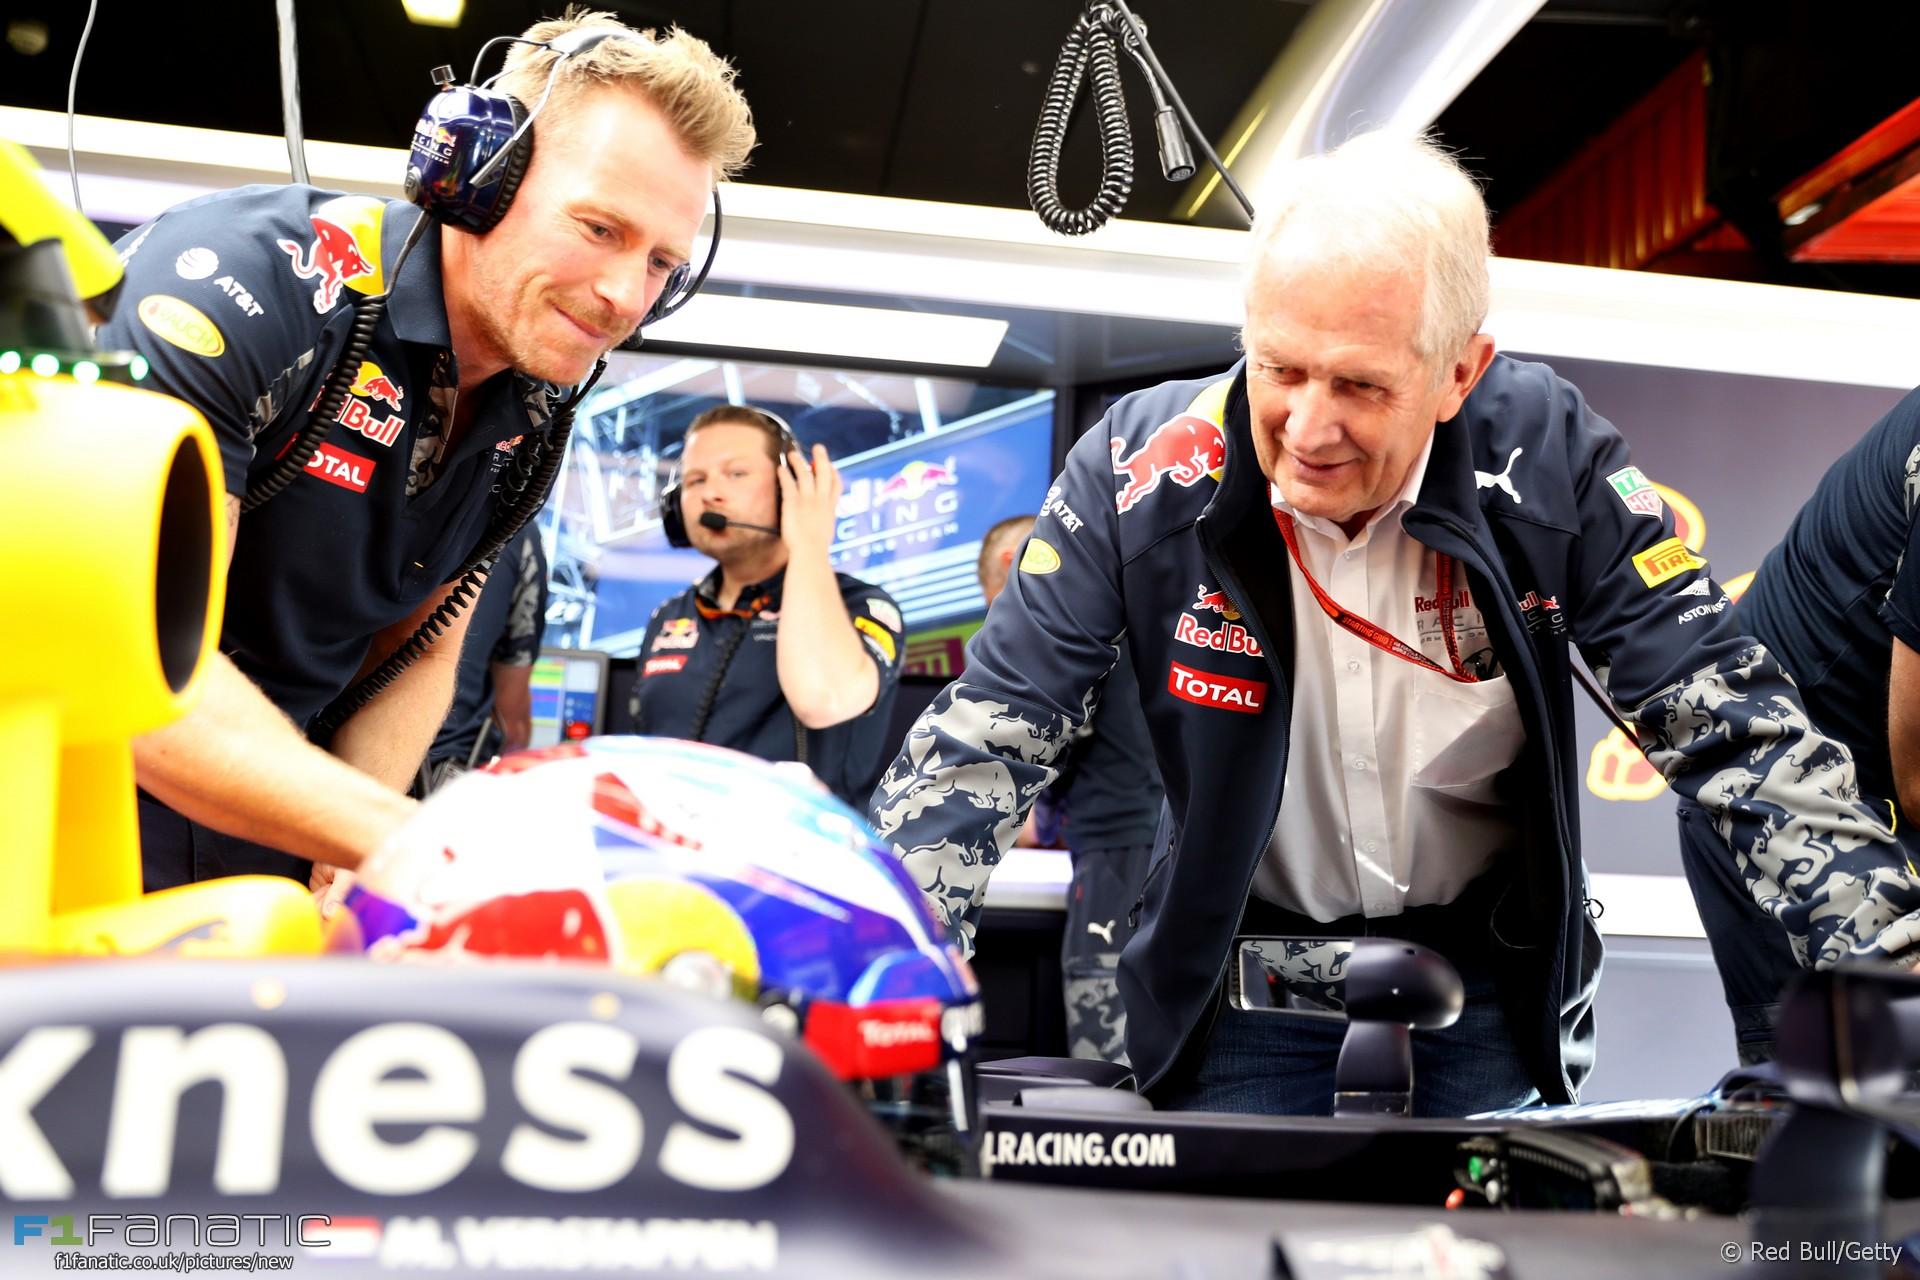 Helmut Marko, Max Verstappen, Red Bull, Circuit de Catalunya, 2016